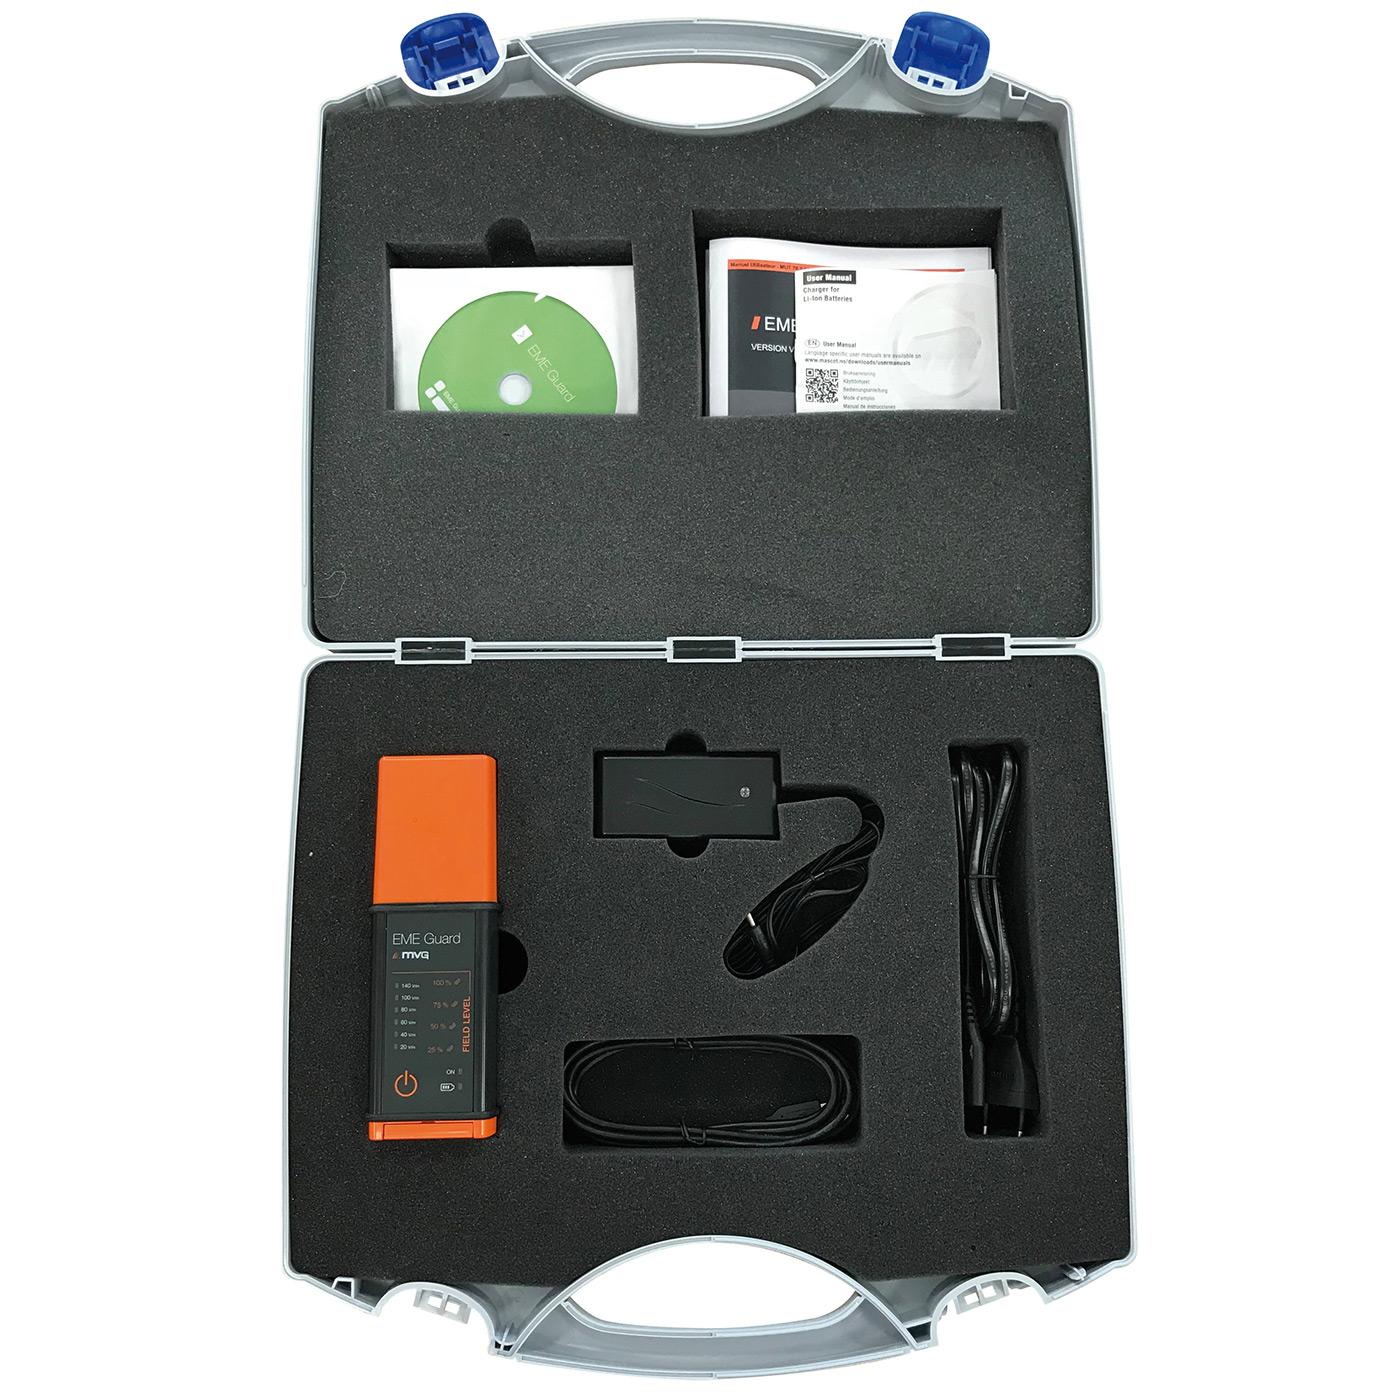 MVG Guard case